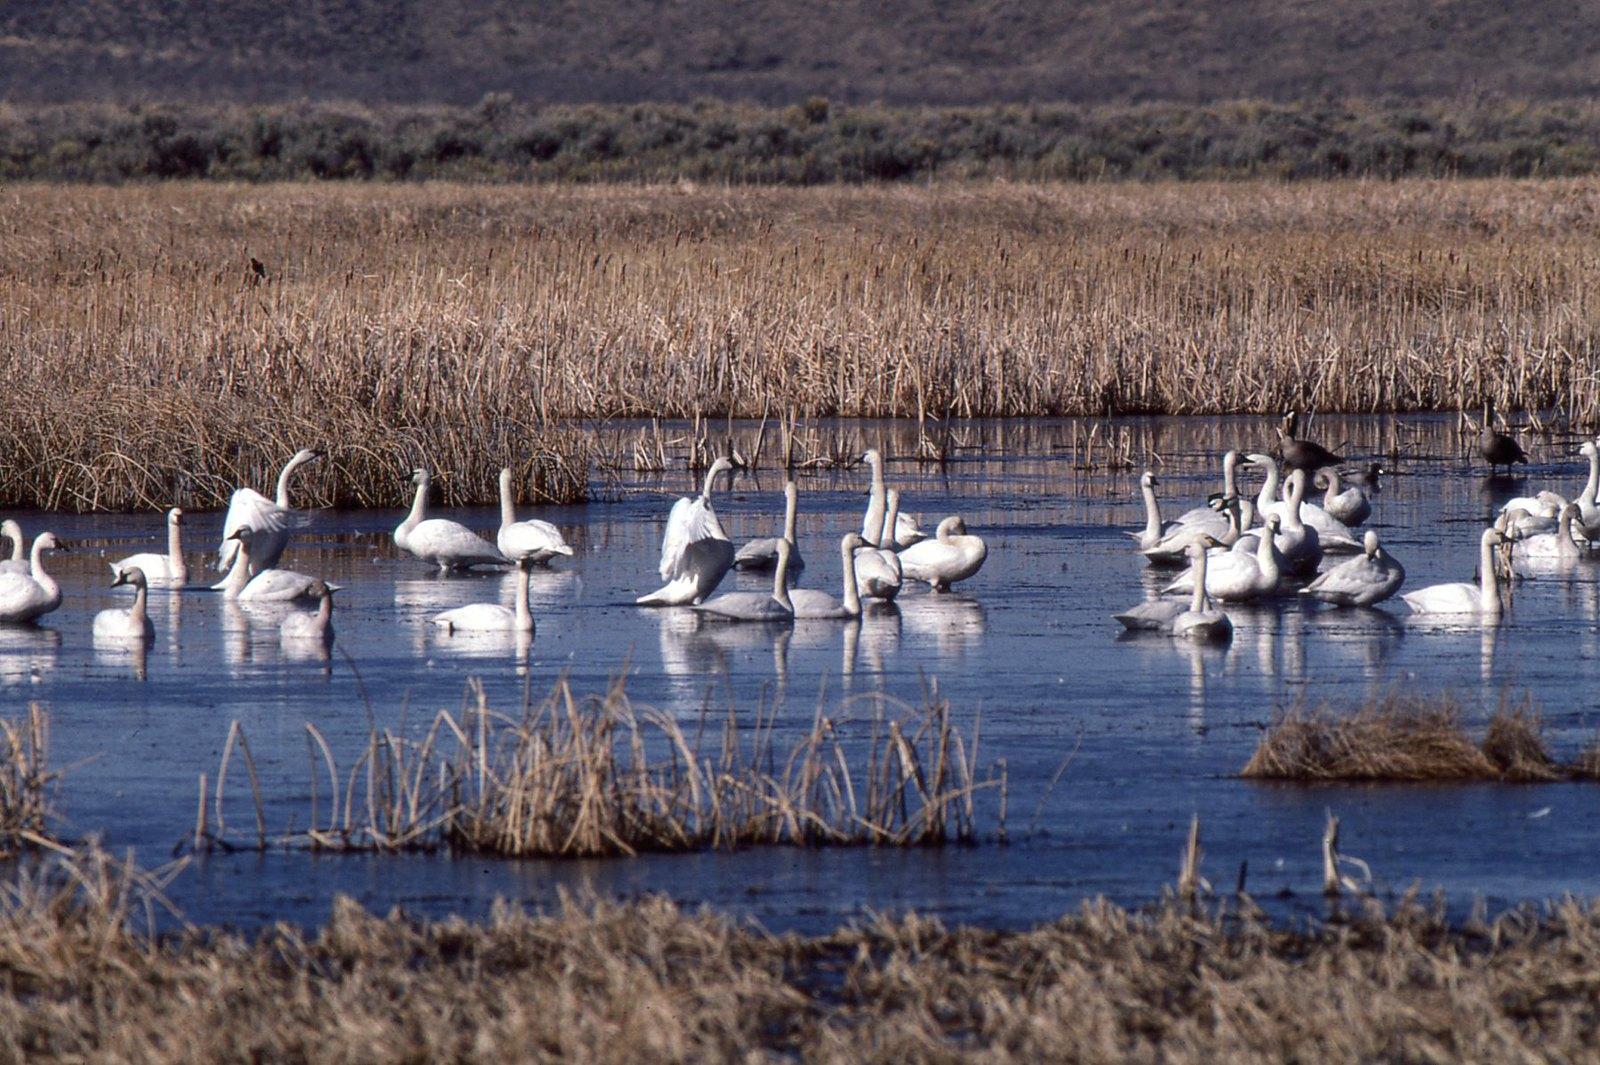 img113 Tundra Swans - Cygnus columbianus | by Jon. D. Anderson